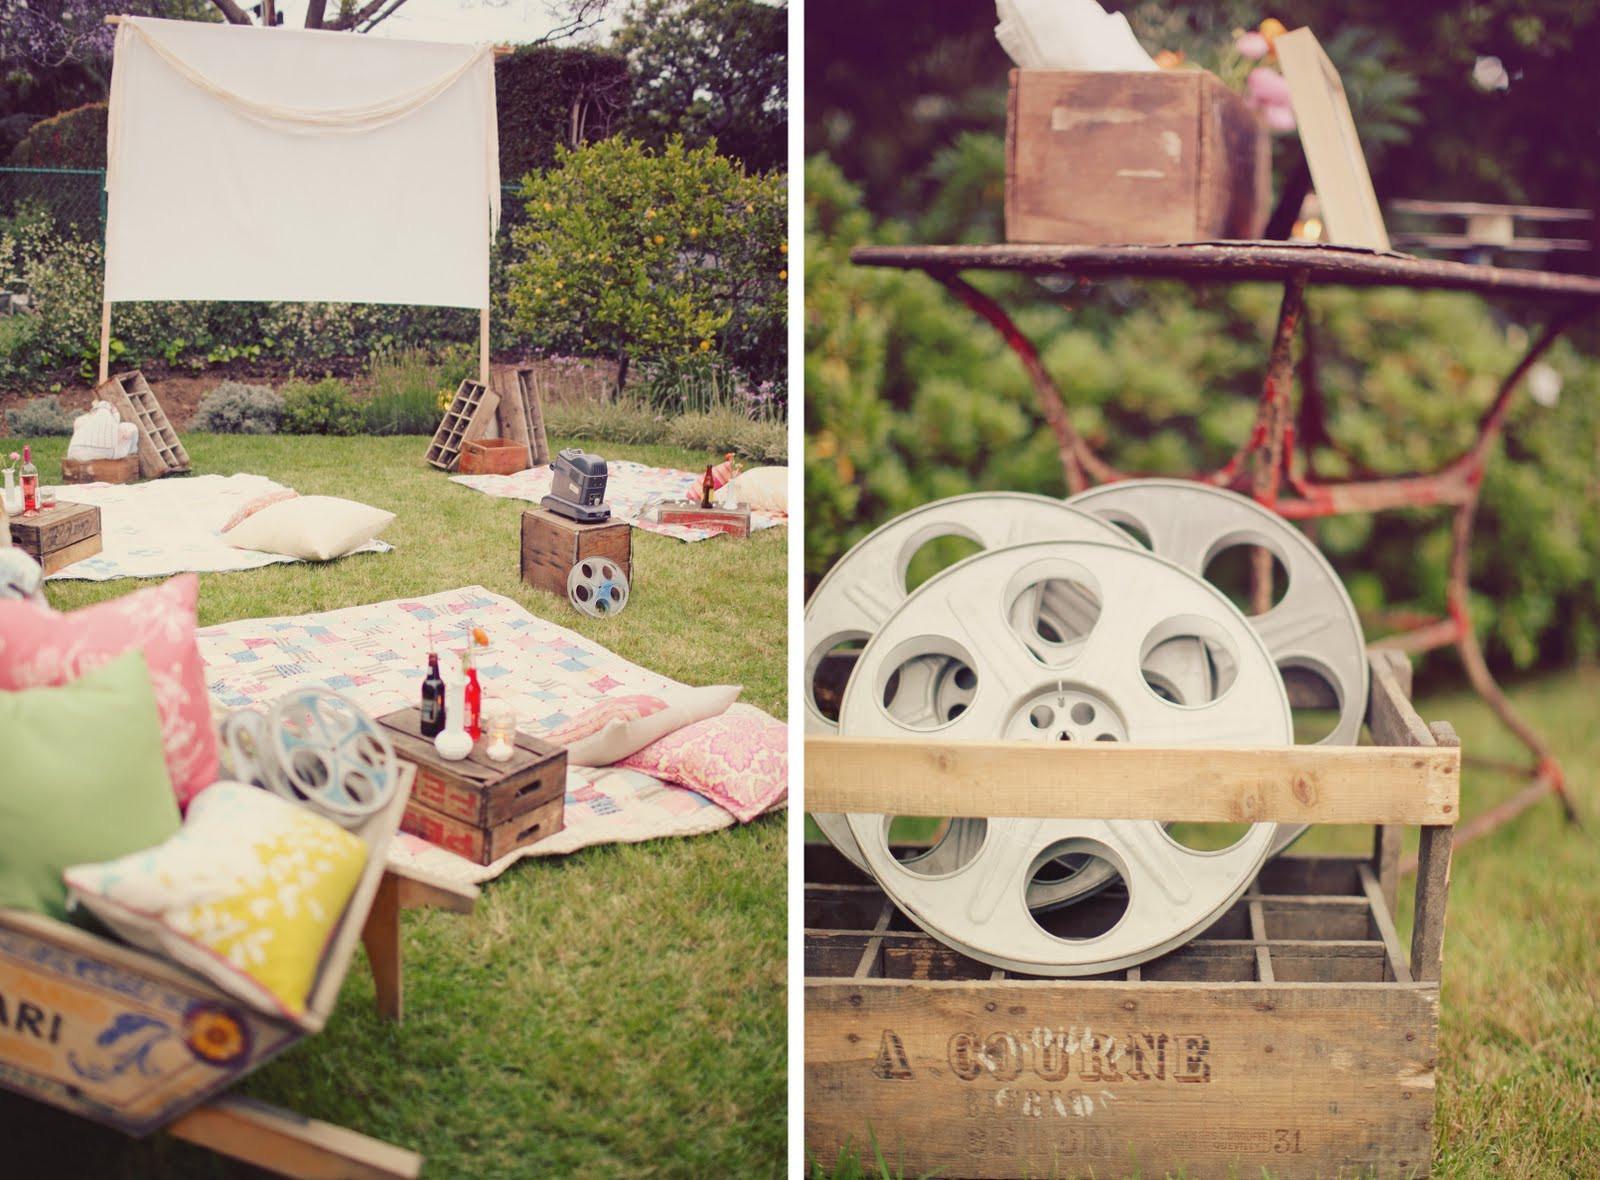 Backyard Movie Party Ideas  Entertaining Hollywood Style A Backyard Movie Screening